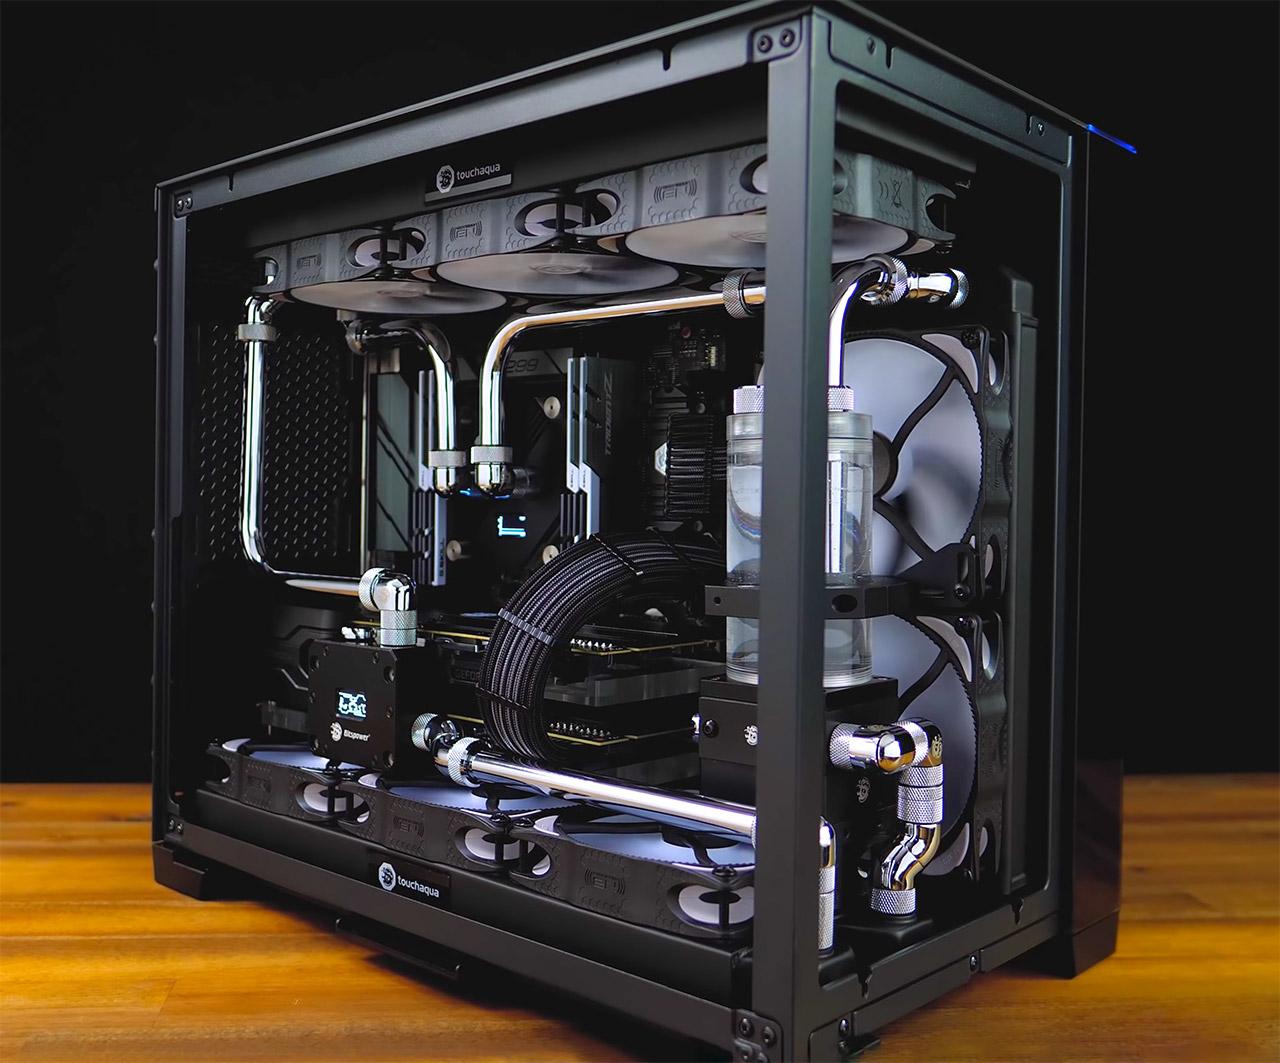 Monochrome mATX O11 PC